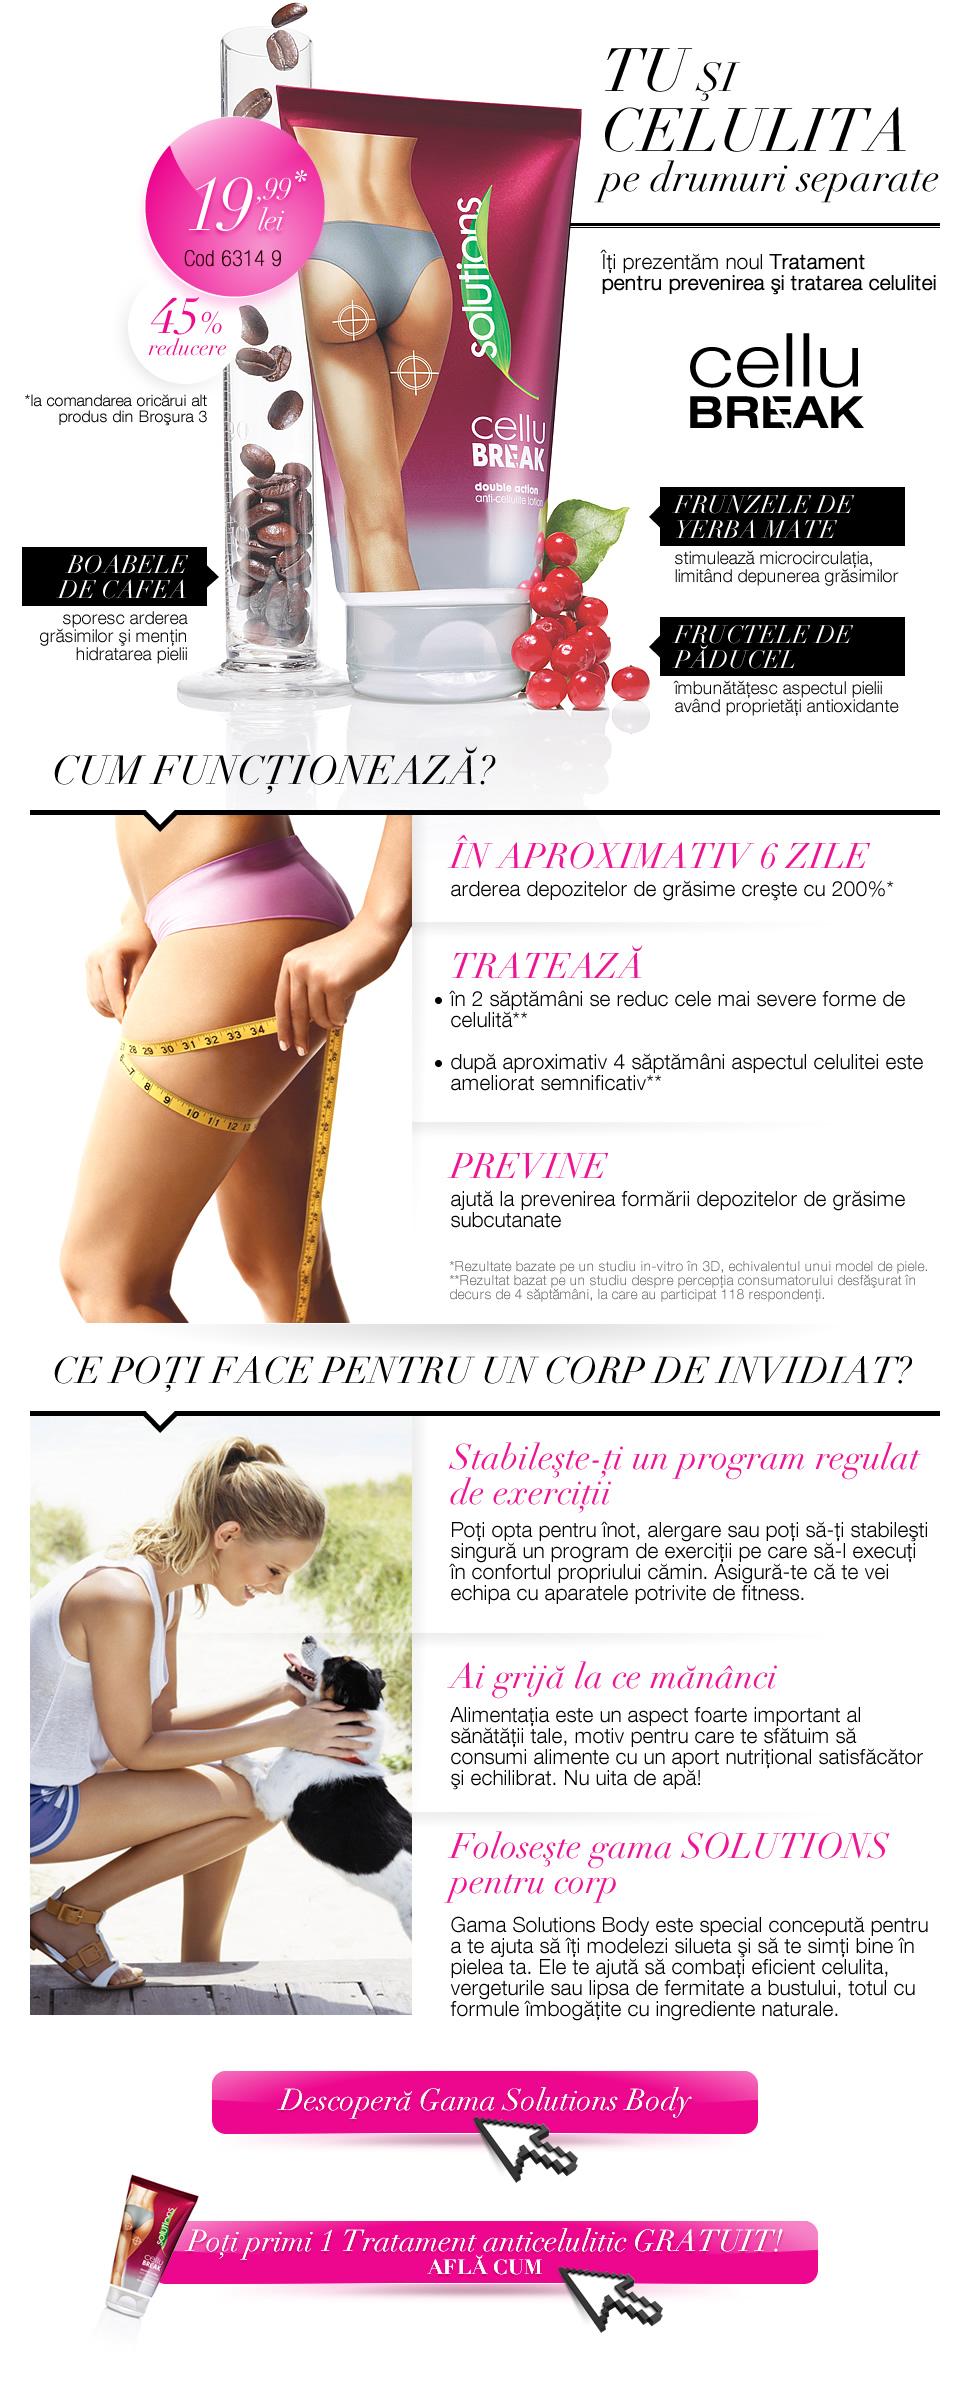 https://www.avoncosmetics.ro/SLSuite/static/images/home_page/2013/c05_zn/Cum_scapi_de_celulita/images/1.jpg